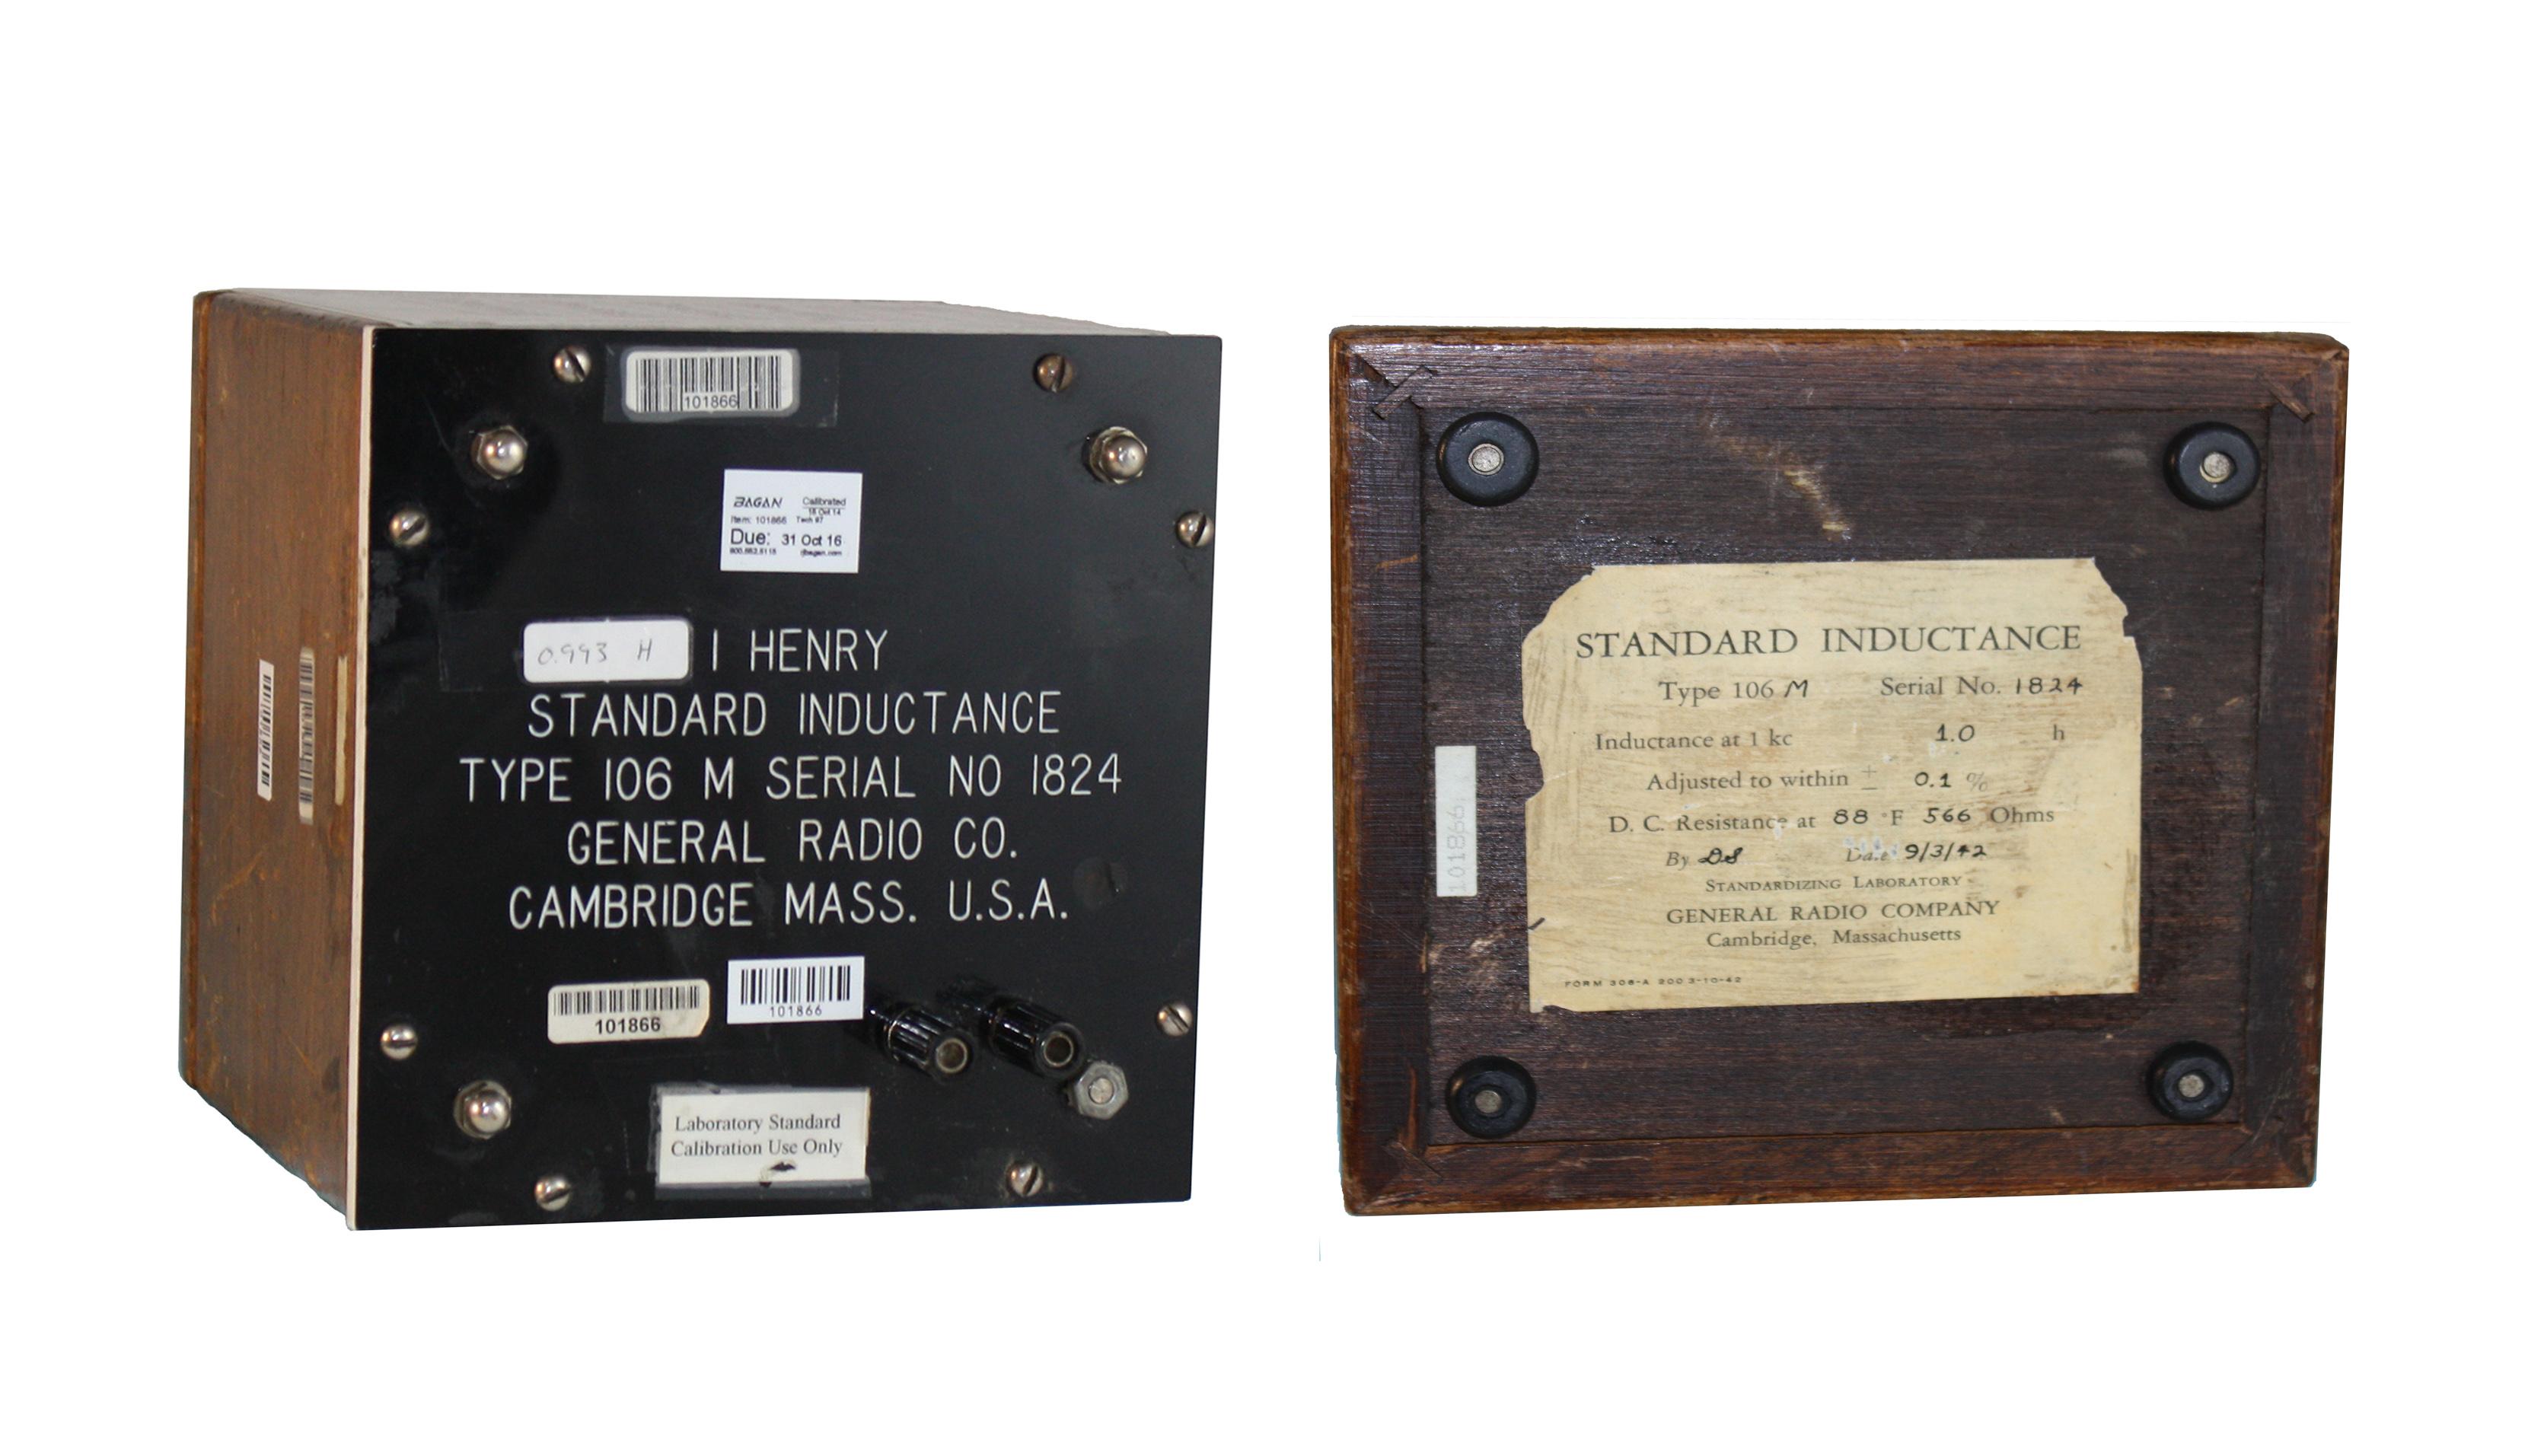 GenRad 106-M Standard Toroidal Inductor